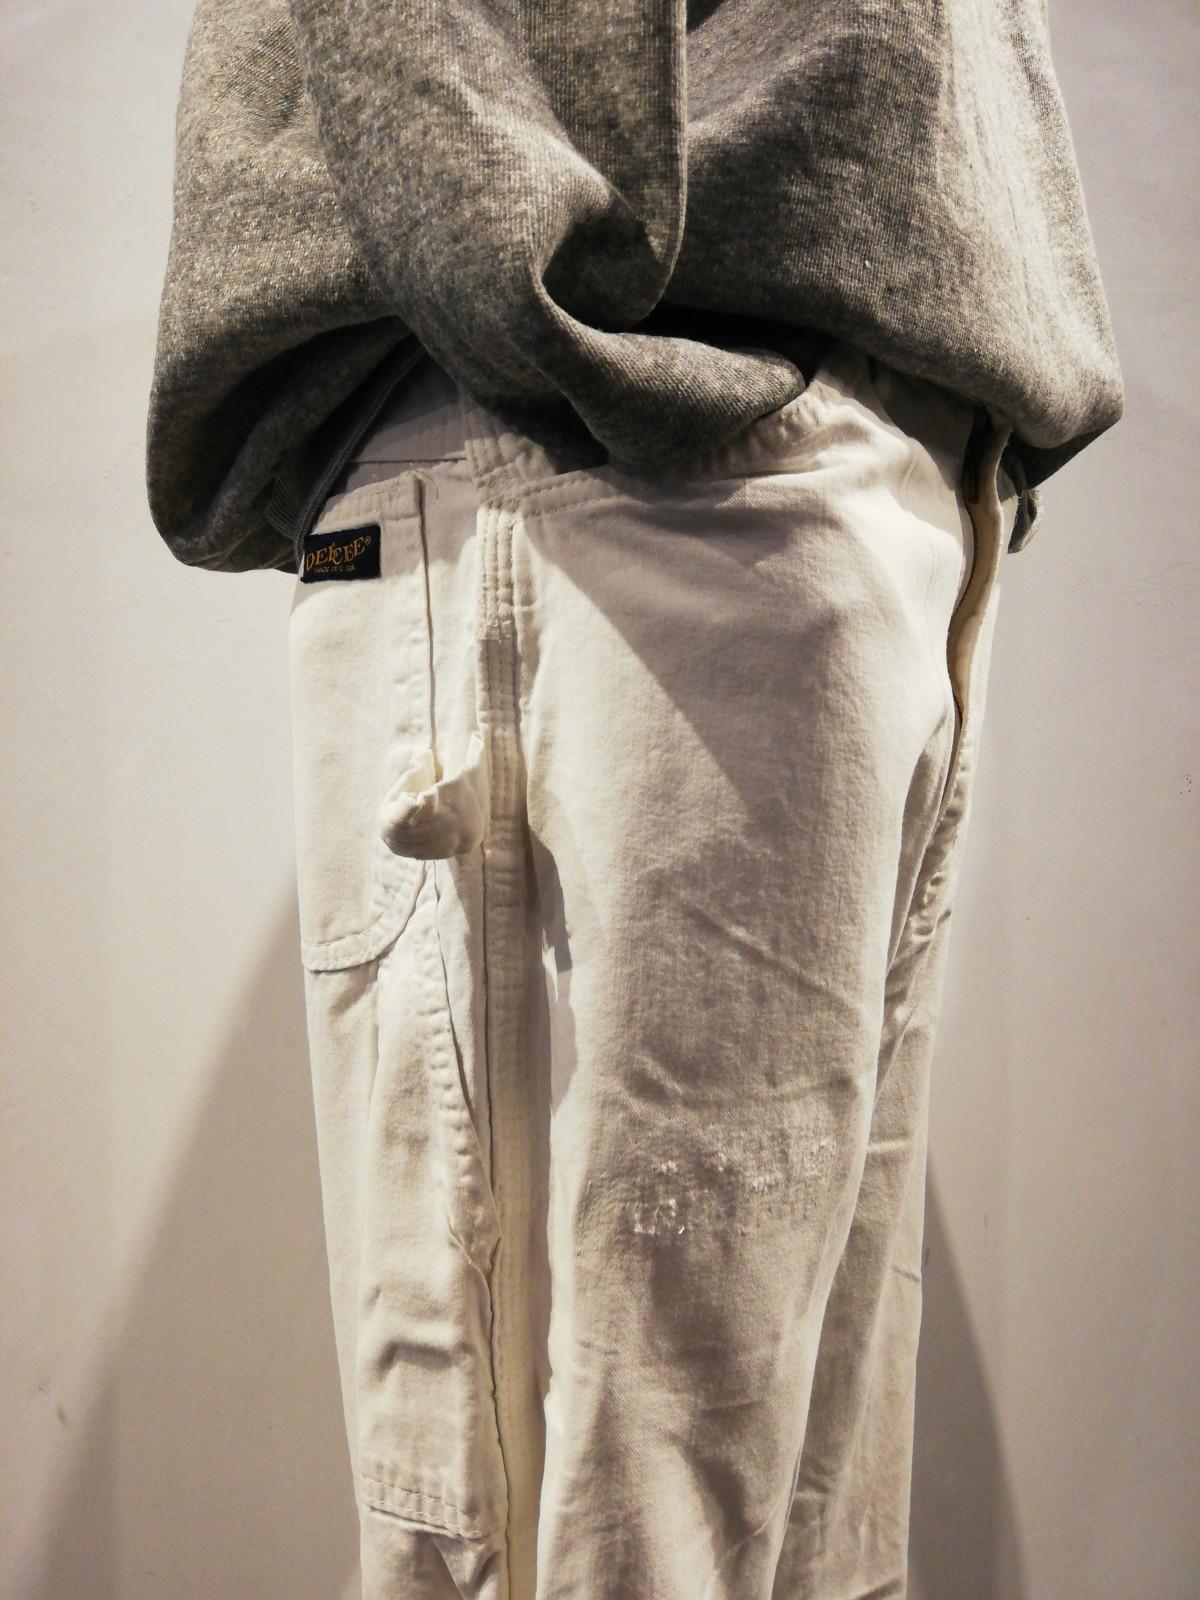 DEECEE,painter pants, USA